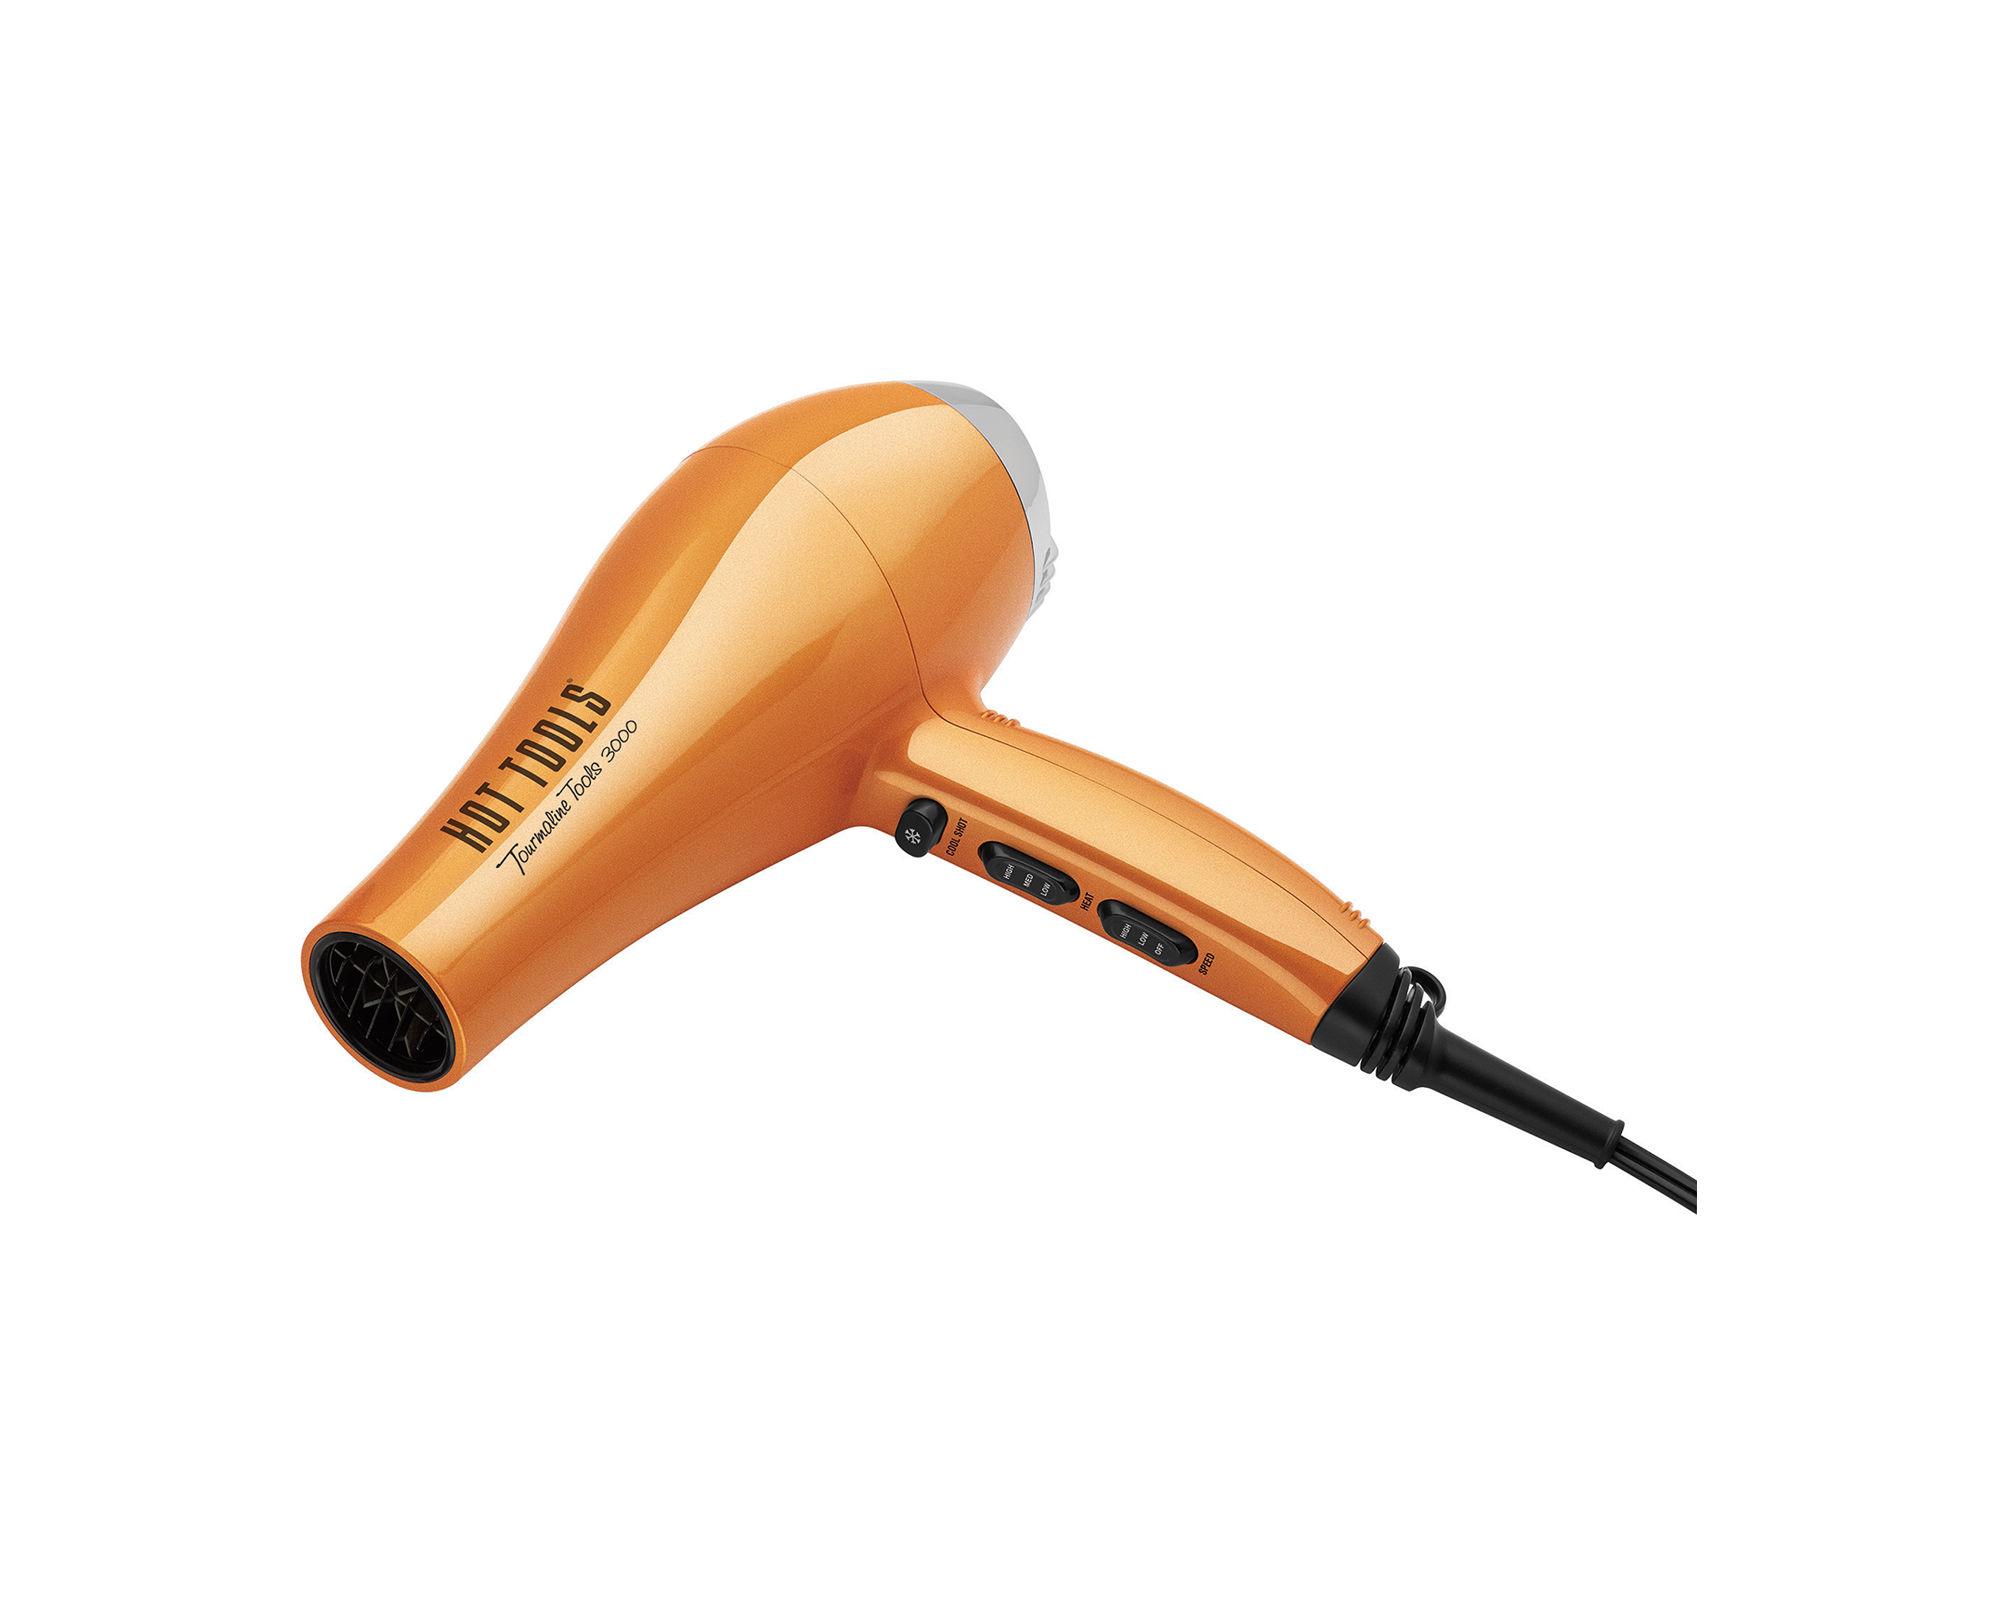 Hot Tools Tourmaline Tools 3000 Ionic Hair Dryer